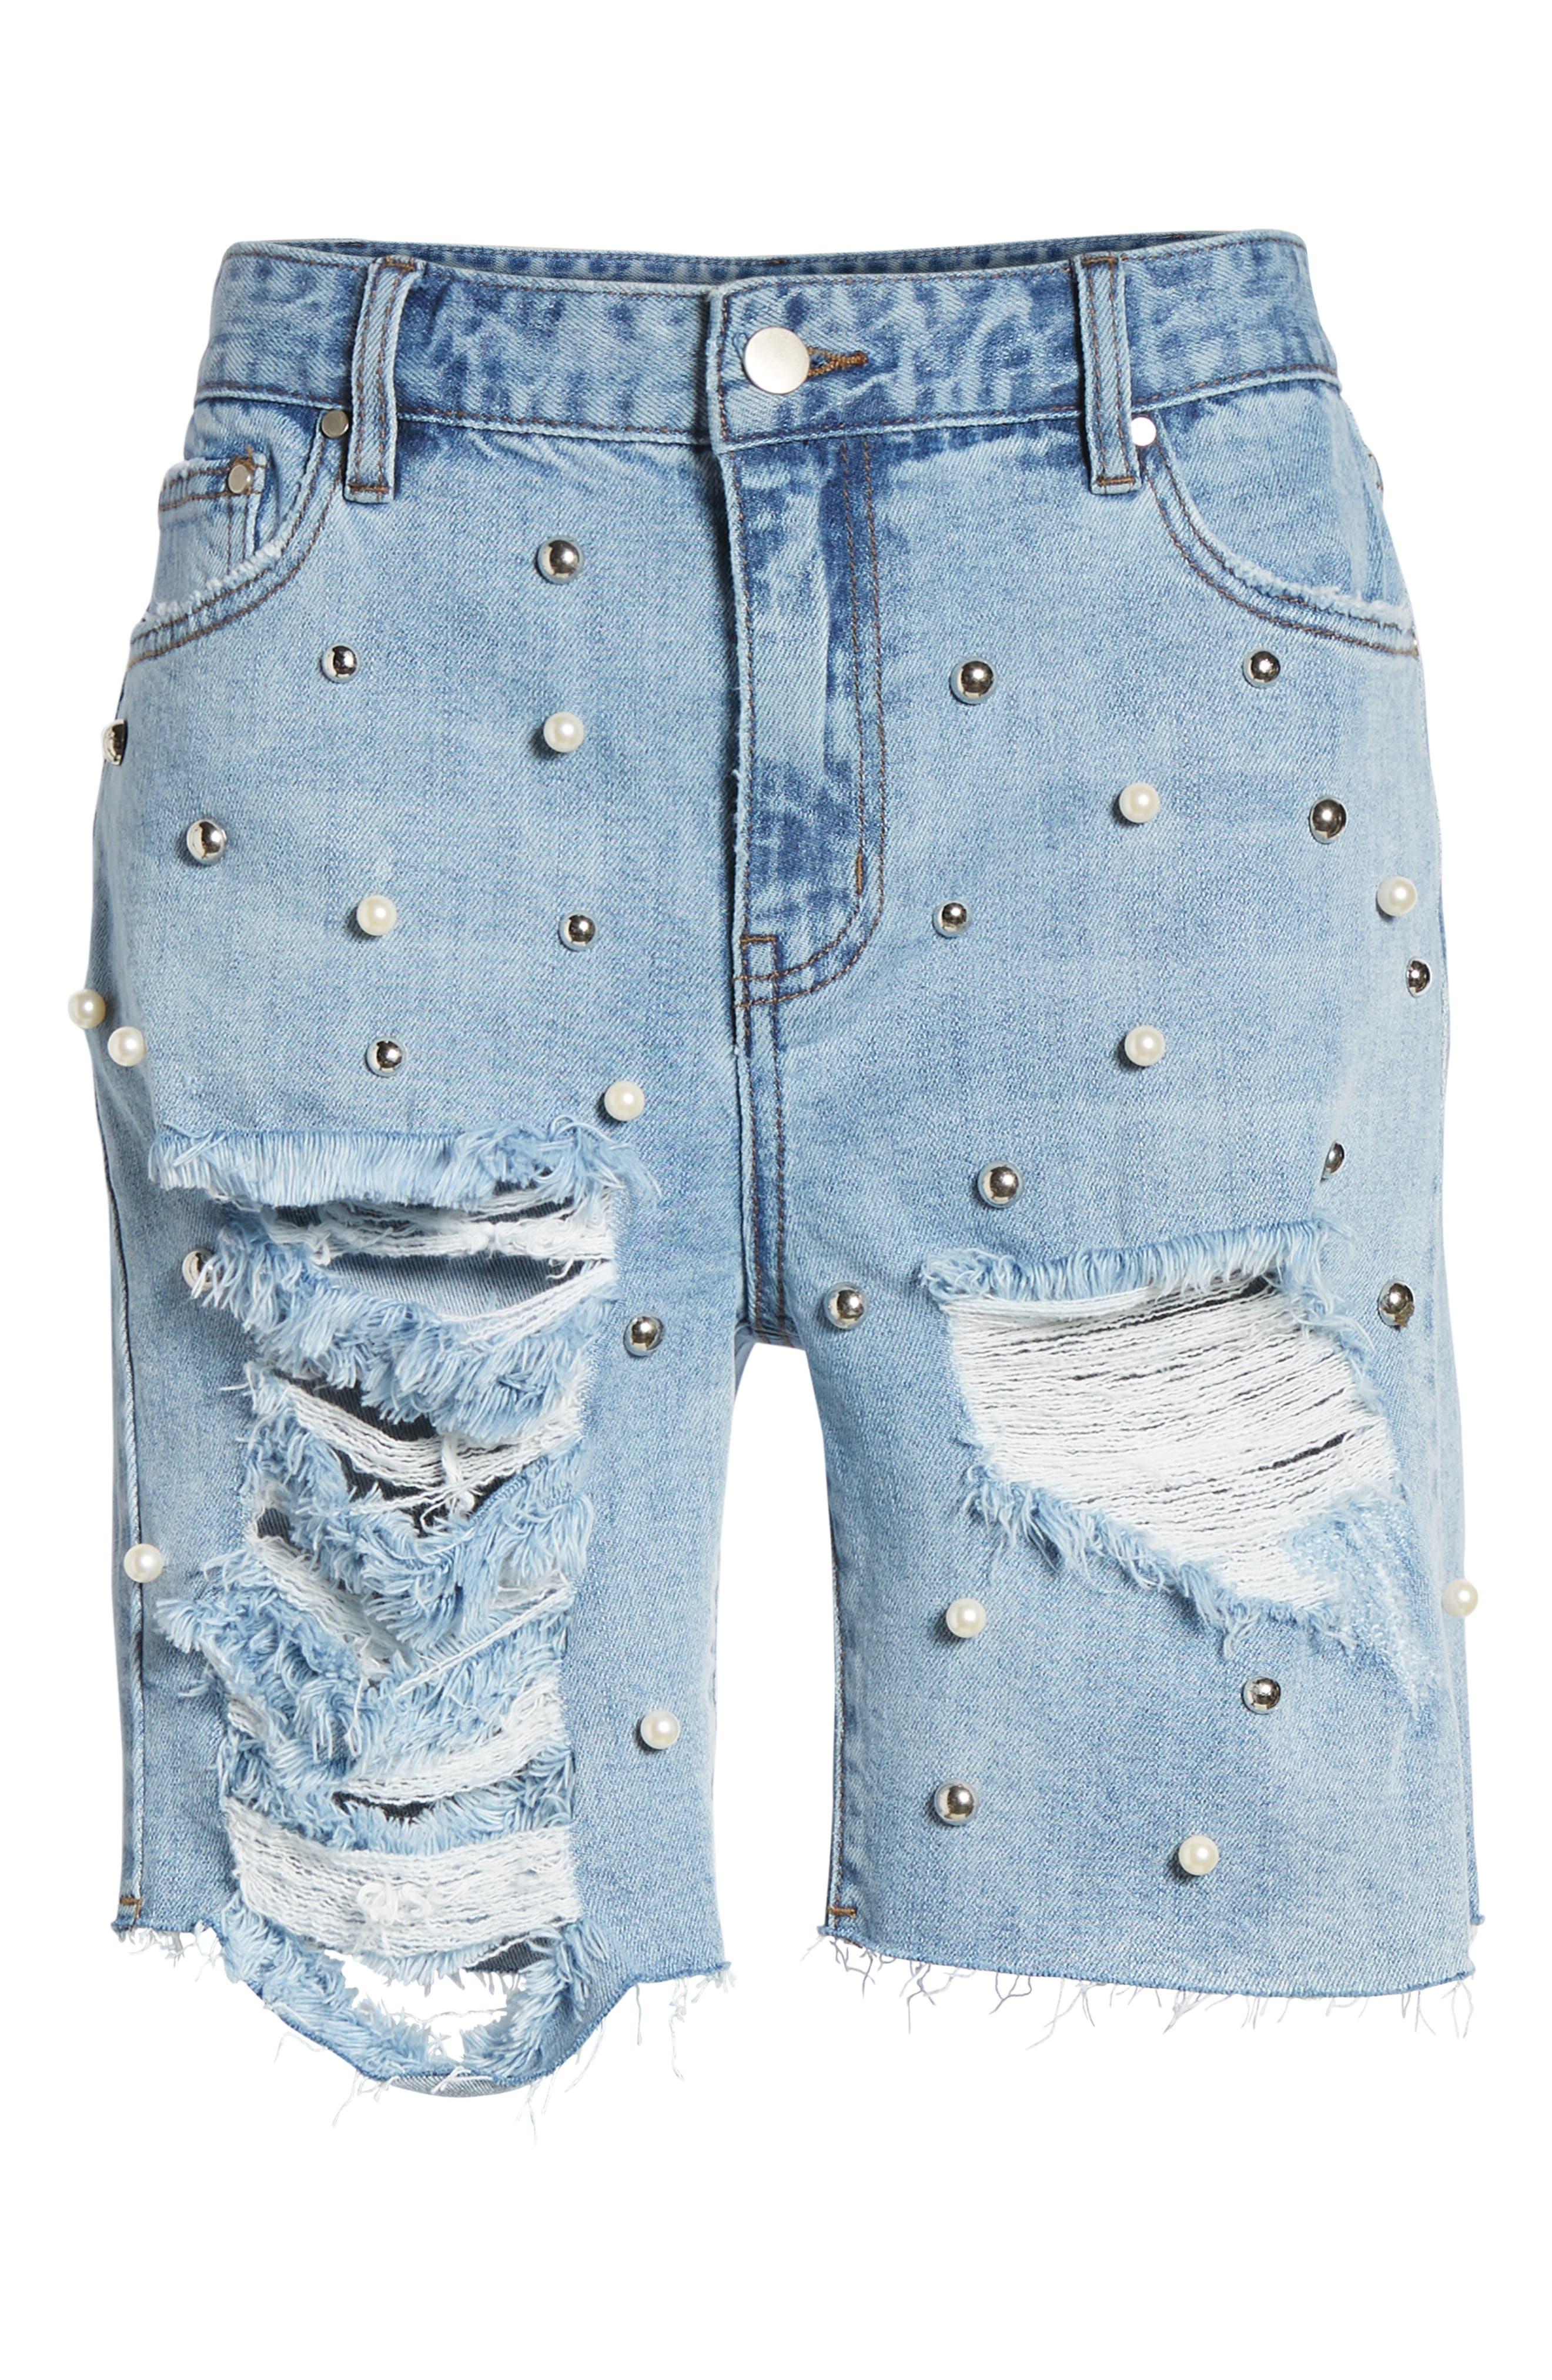 Imitation Pearl & Stud Ripped Denim Bermuda Shorts,                             Alternate thumbnail 7, color,                             400